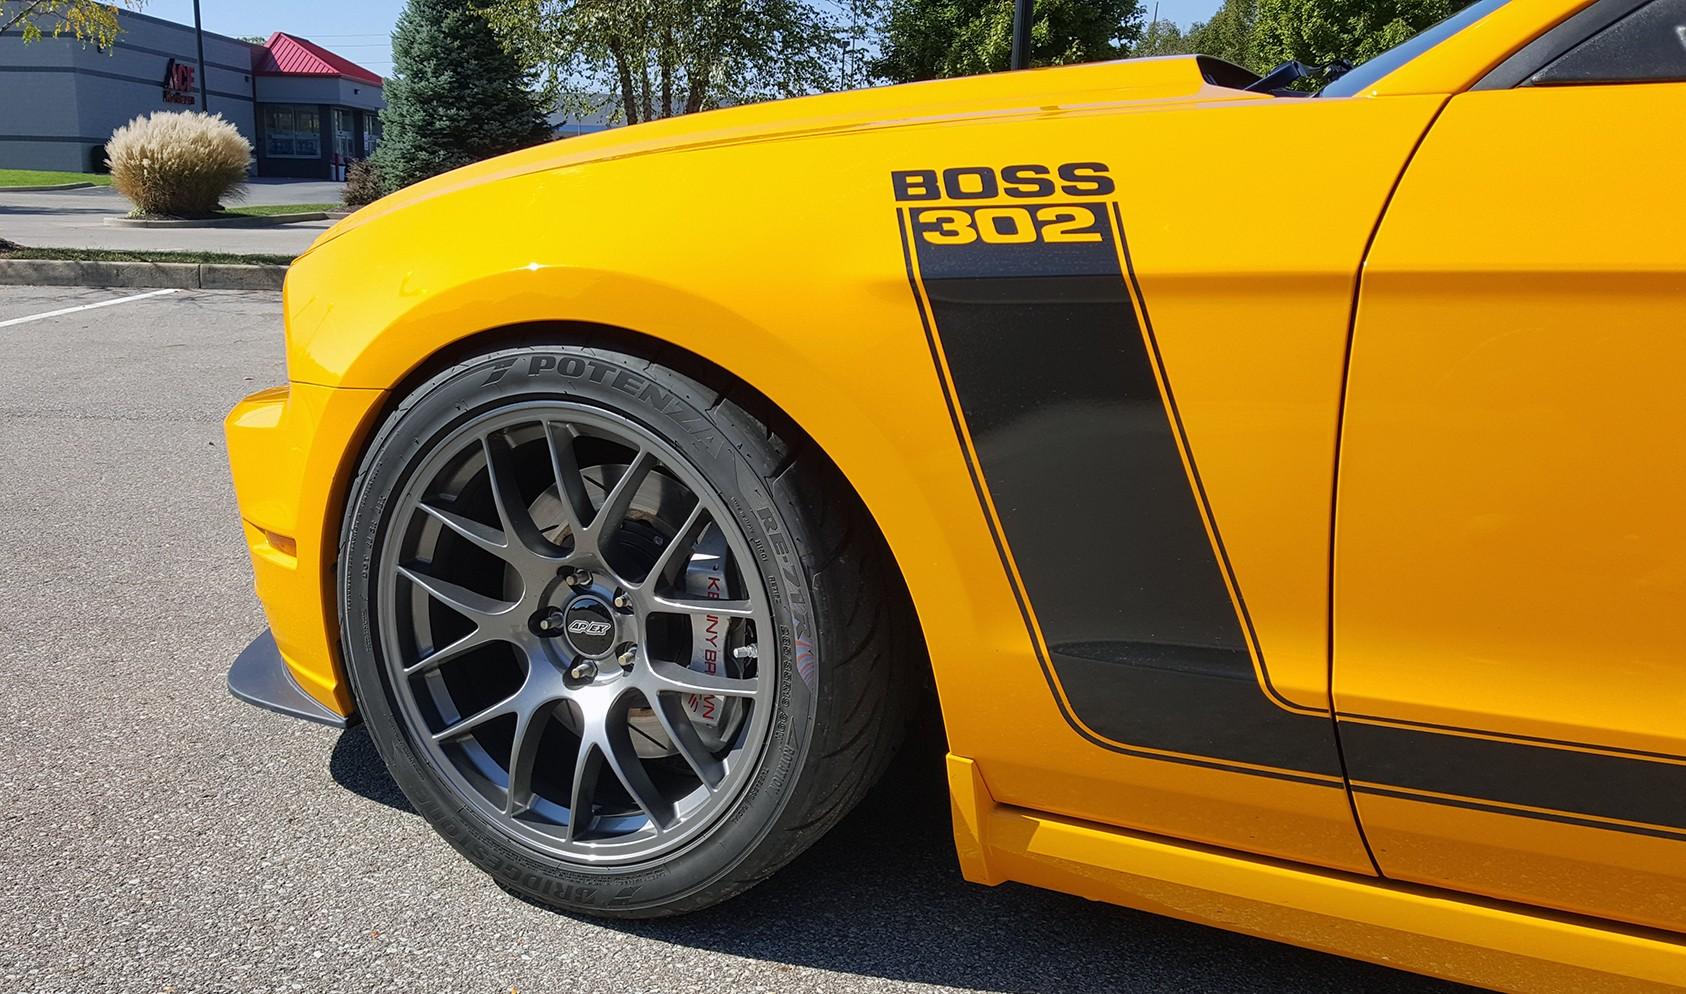 S197 Boss 302 Square Fitment<br />Wheels: 19×10″ ET40 Anthracite EC-7<br />Tires: 285/35-19 Bridgestone RE-71R<br />Mods: Extended Stud Kit, 12.5mm front spacers